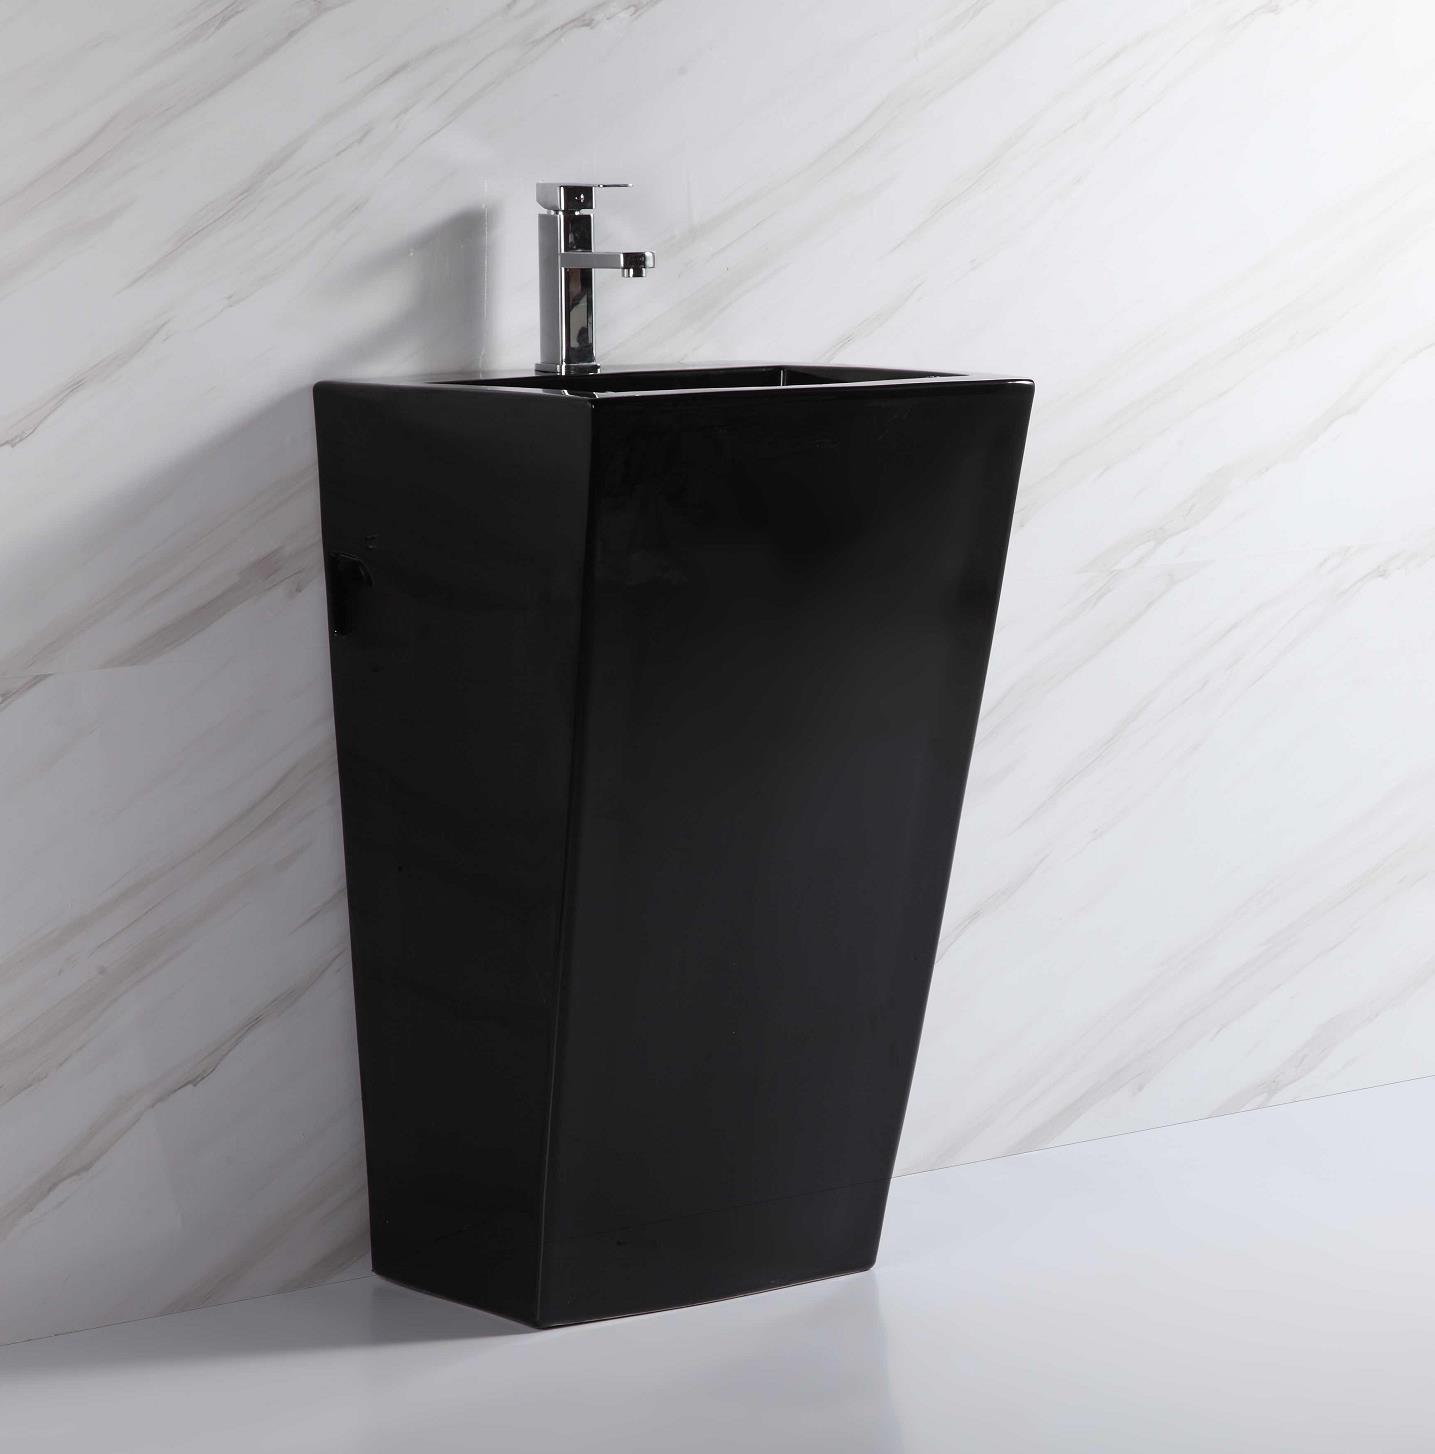 110911 factory direct black color ceramic pedestal basin square shape sink with standing for hotel